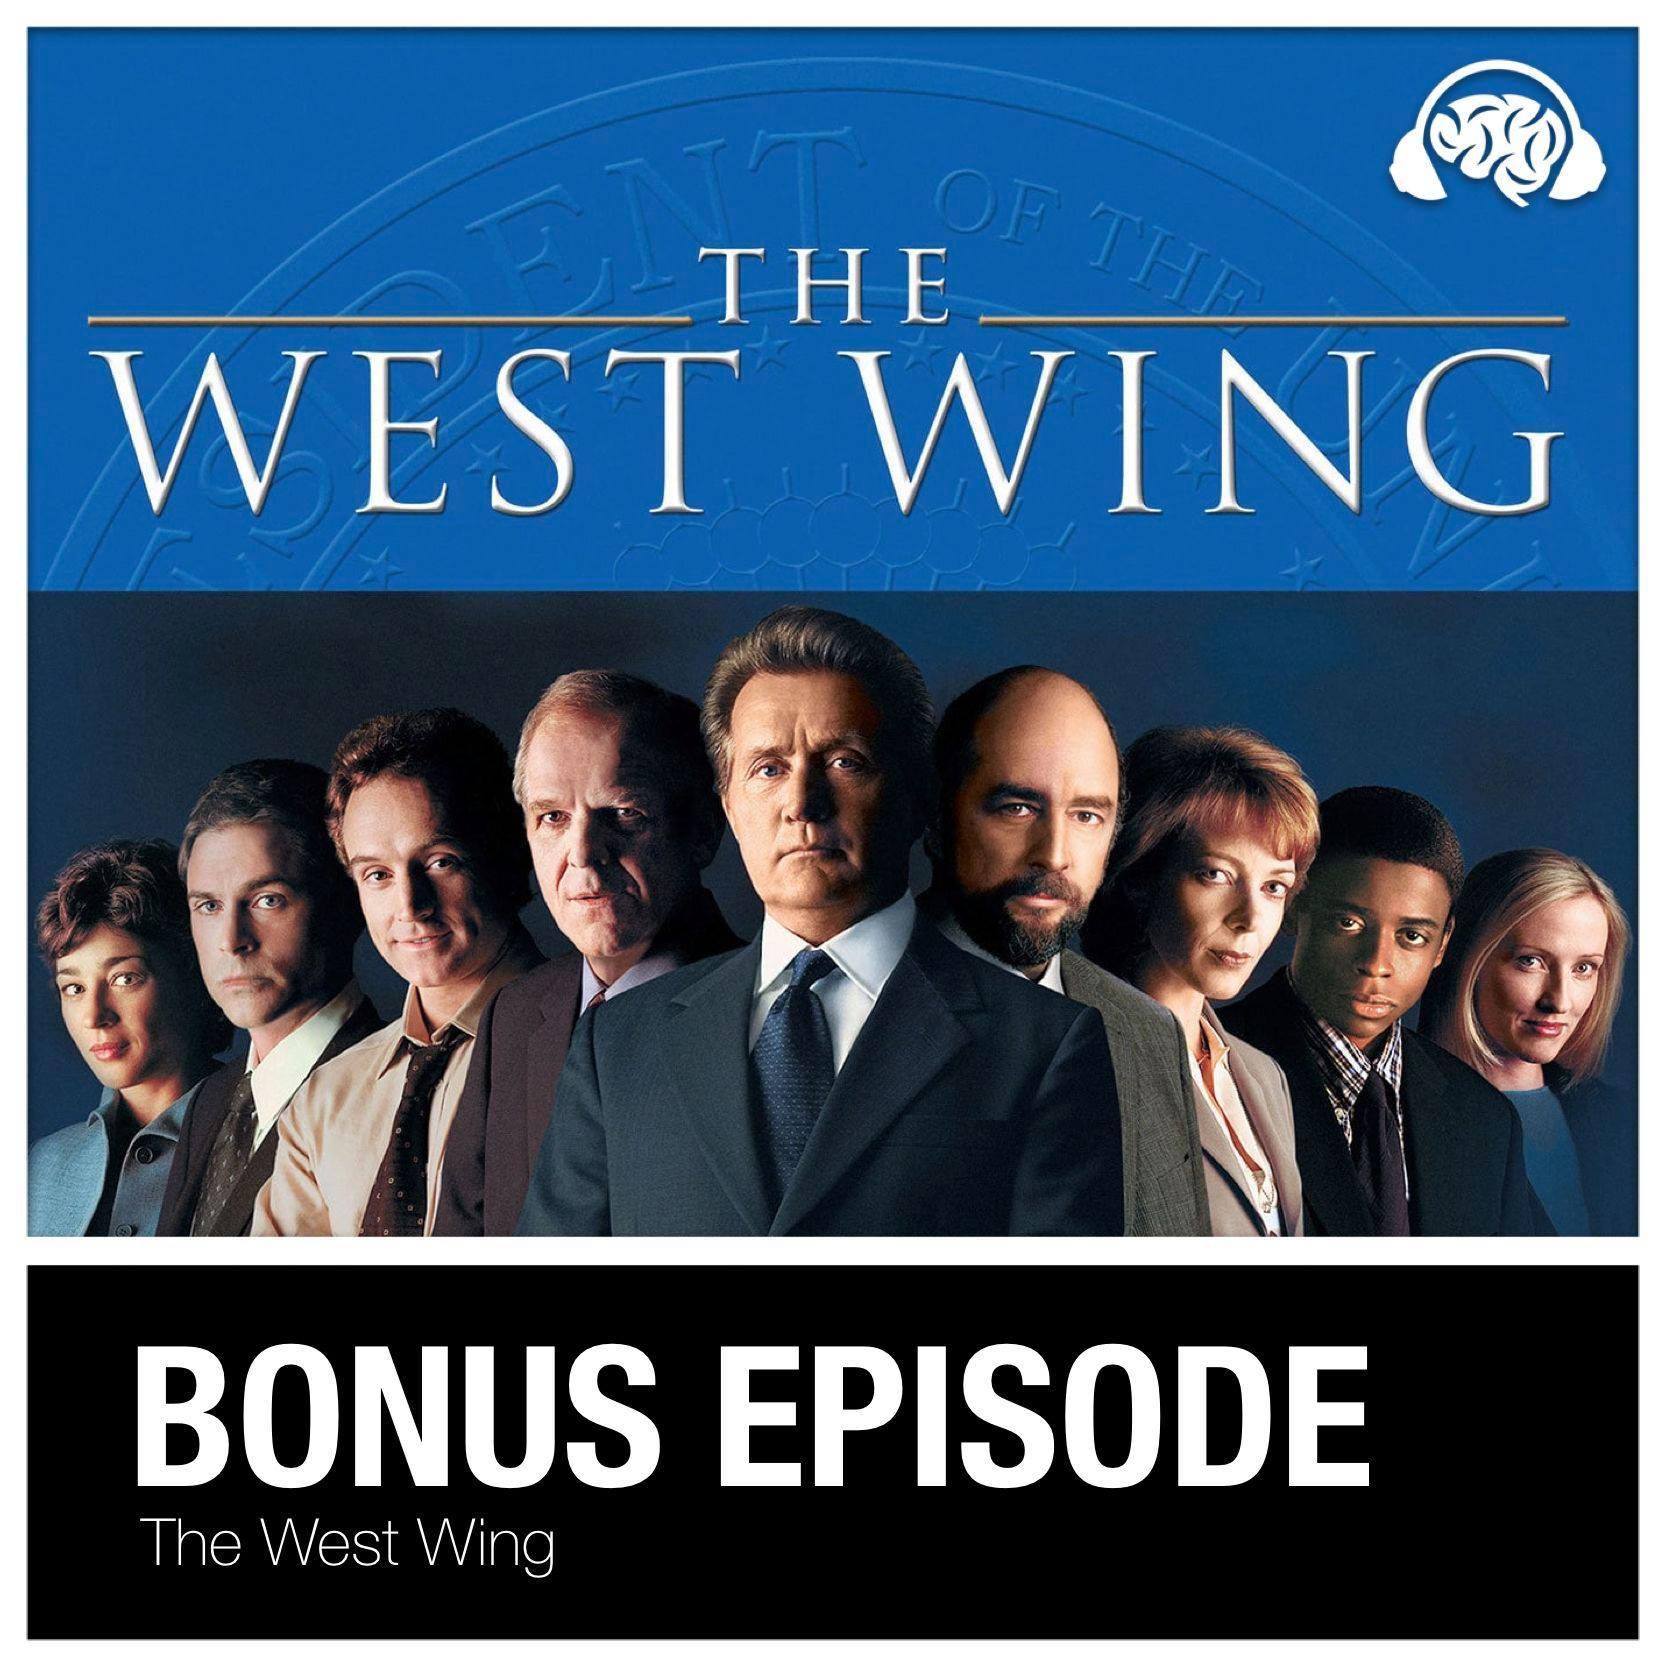 bonuswestwing.jpg